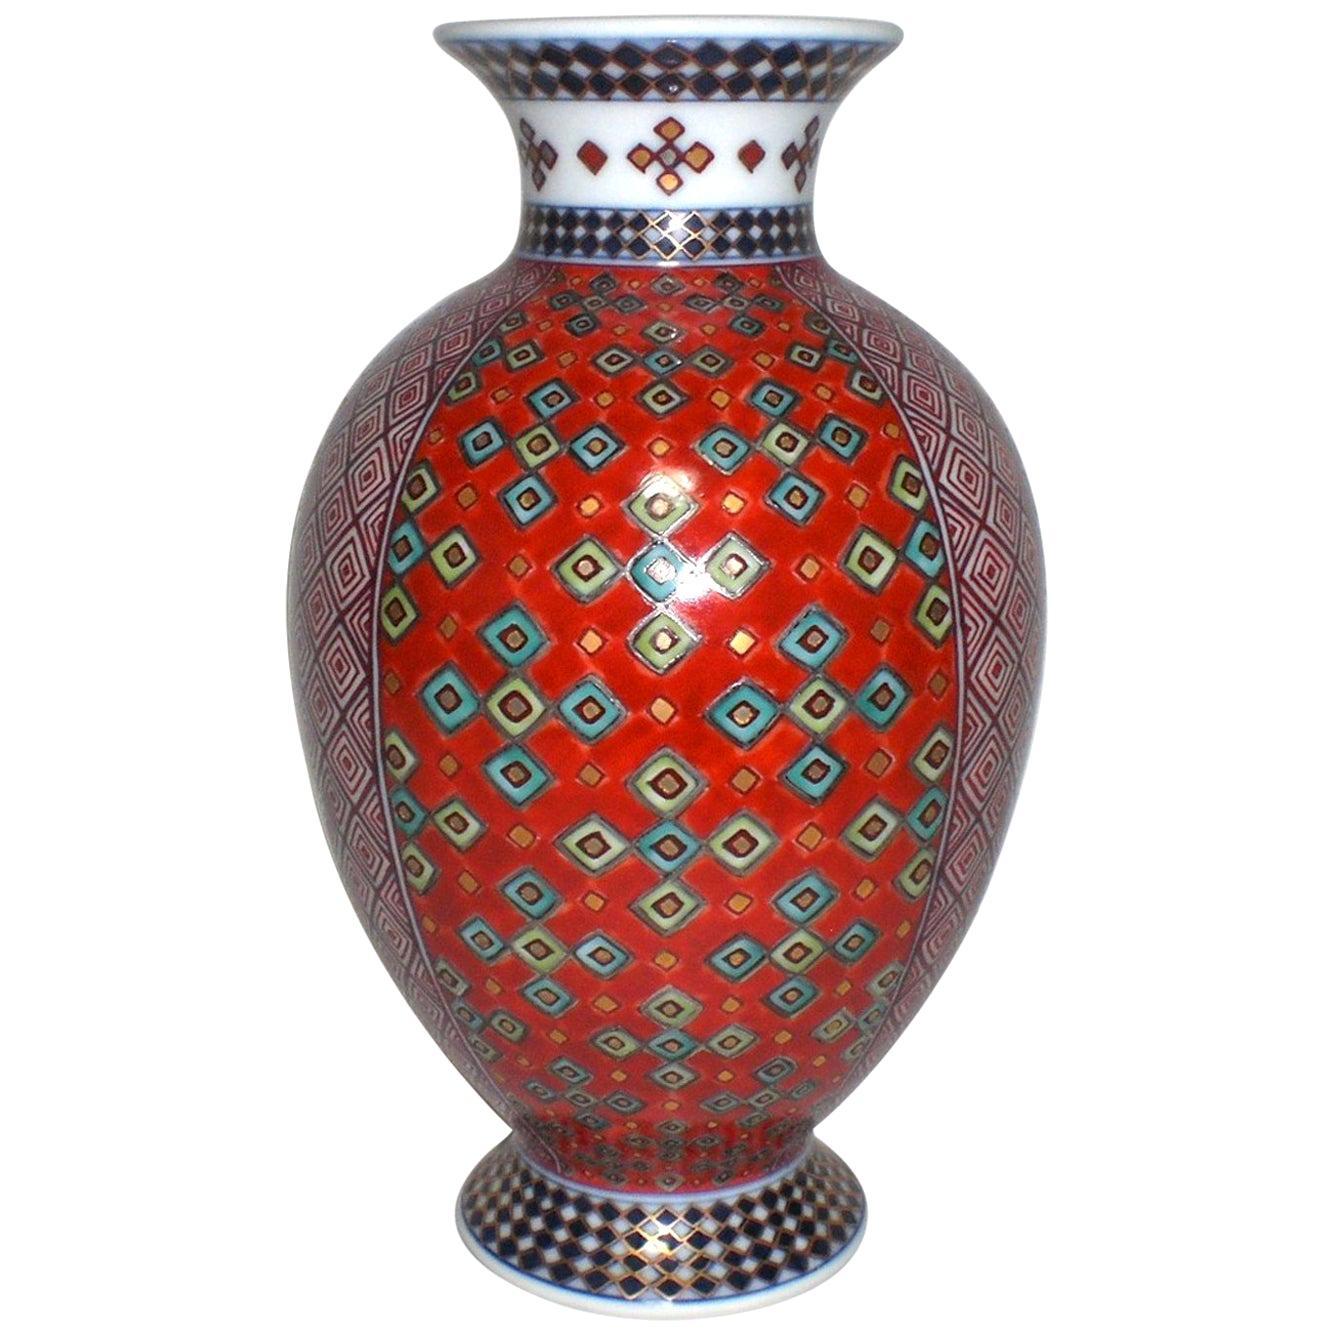 Contemporary Japanese Gilded Red Blue Porcelain Vase by Master Artist